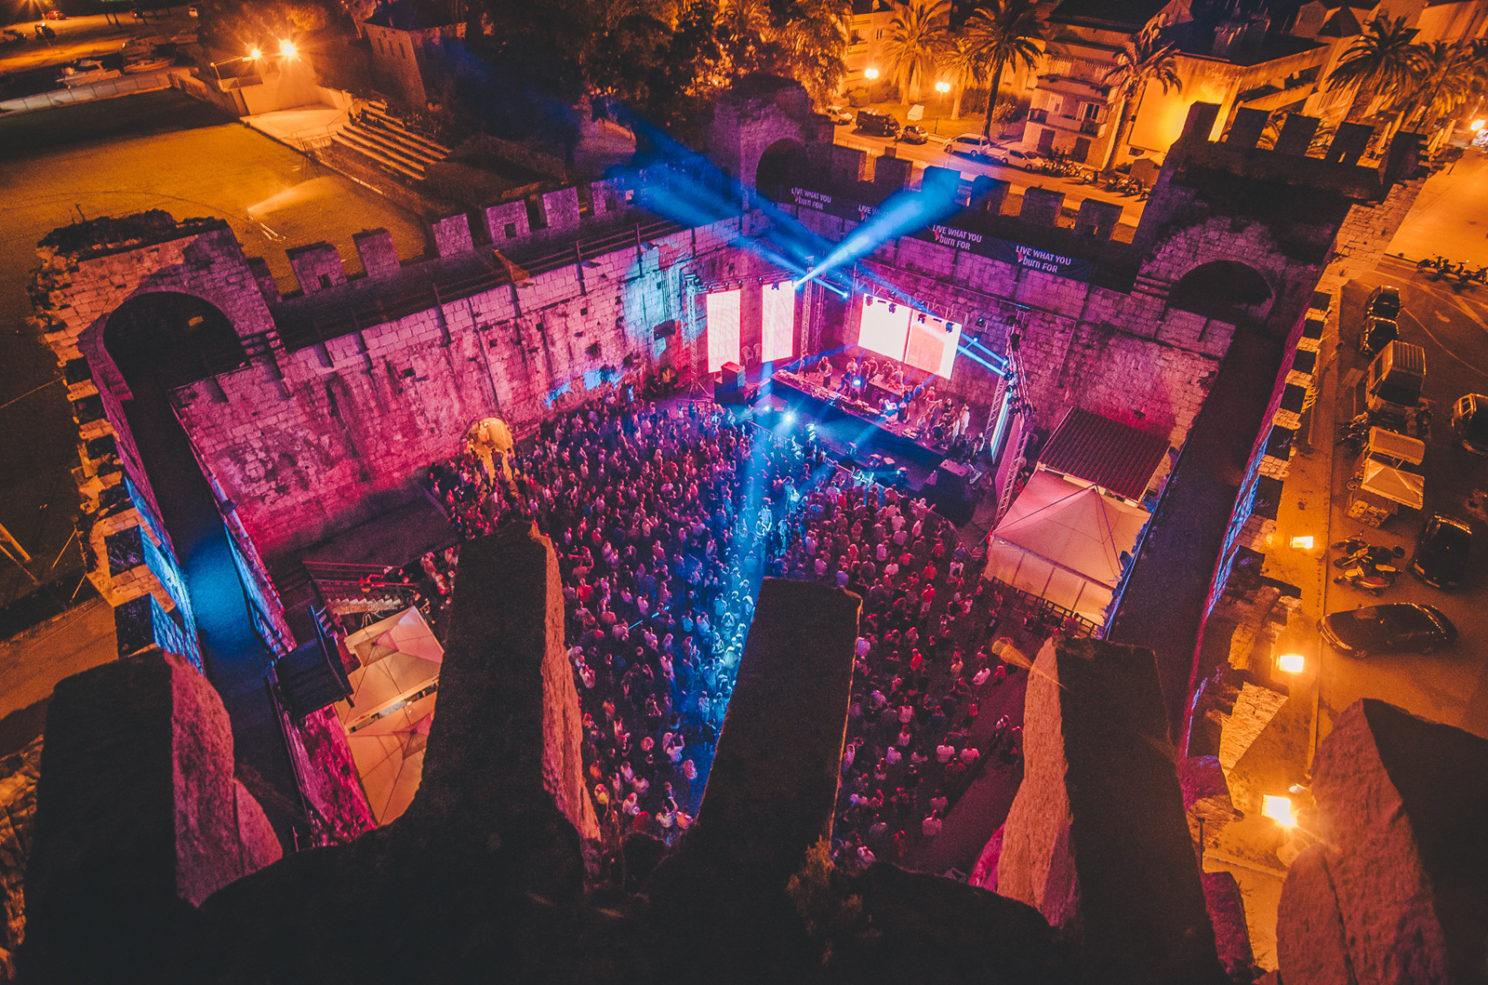 Moondance – Fortaleza Kamerlengo (Trogir, Croacia) del 10 al 12 de agosto